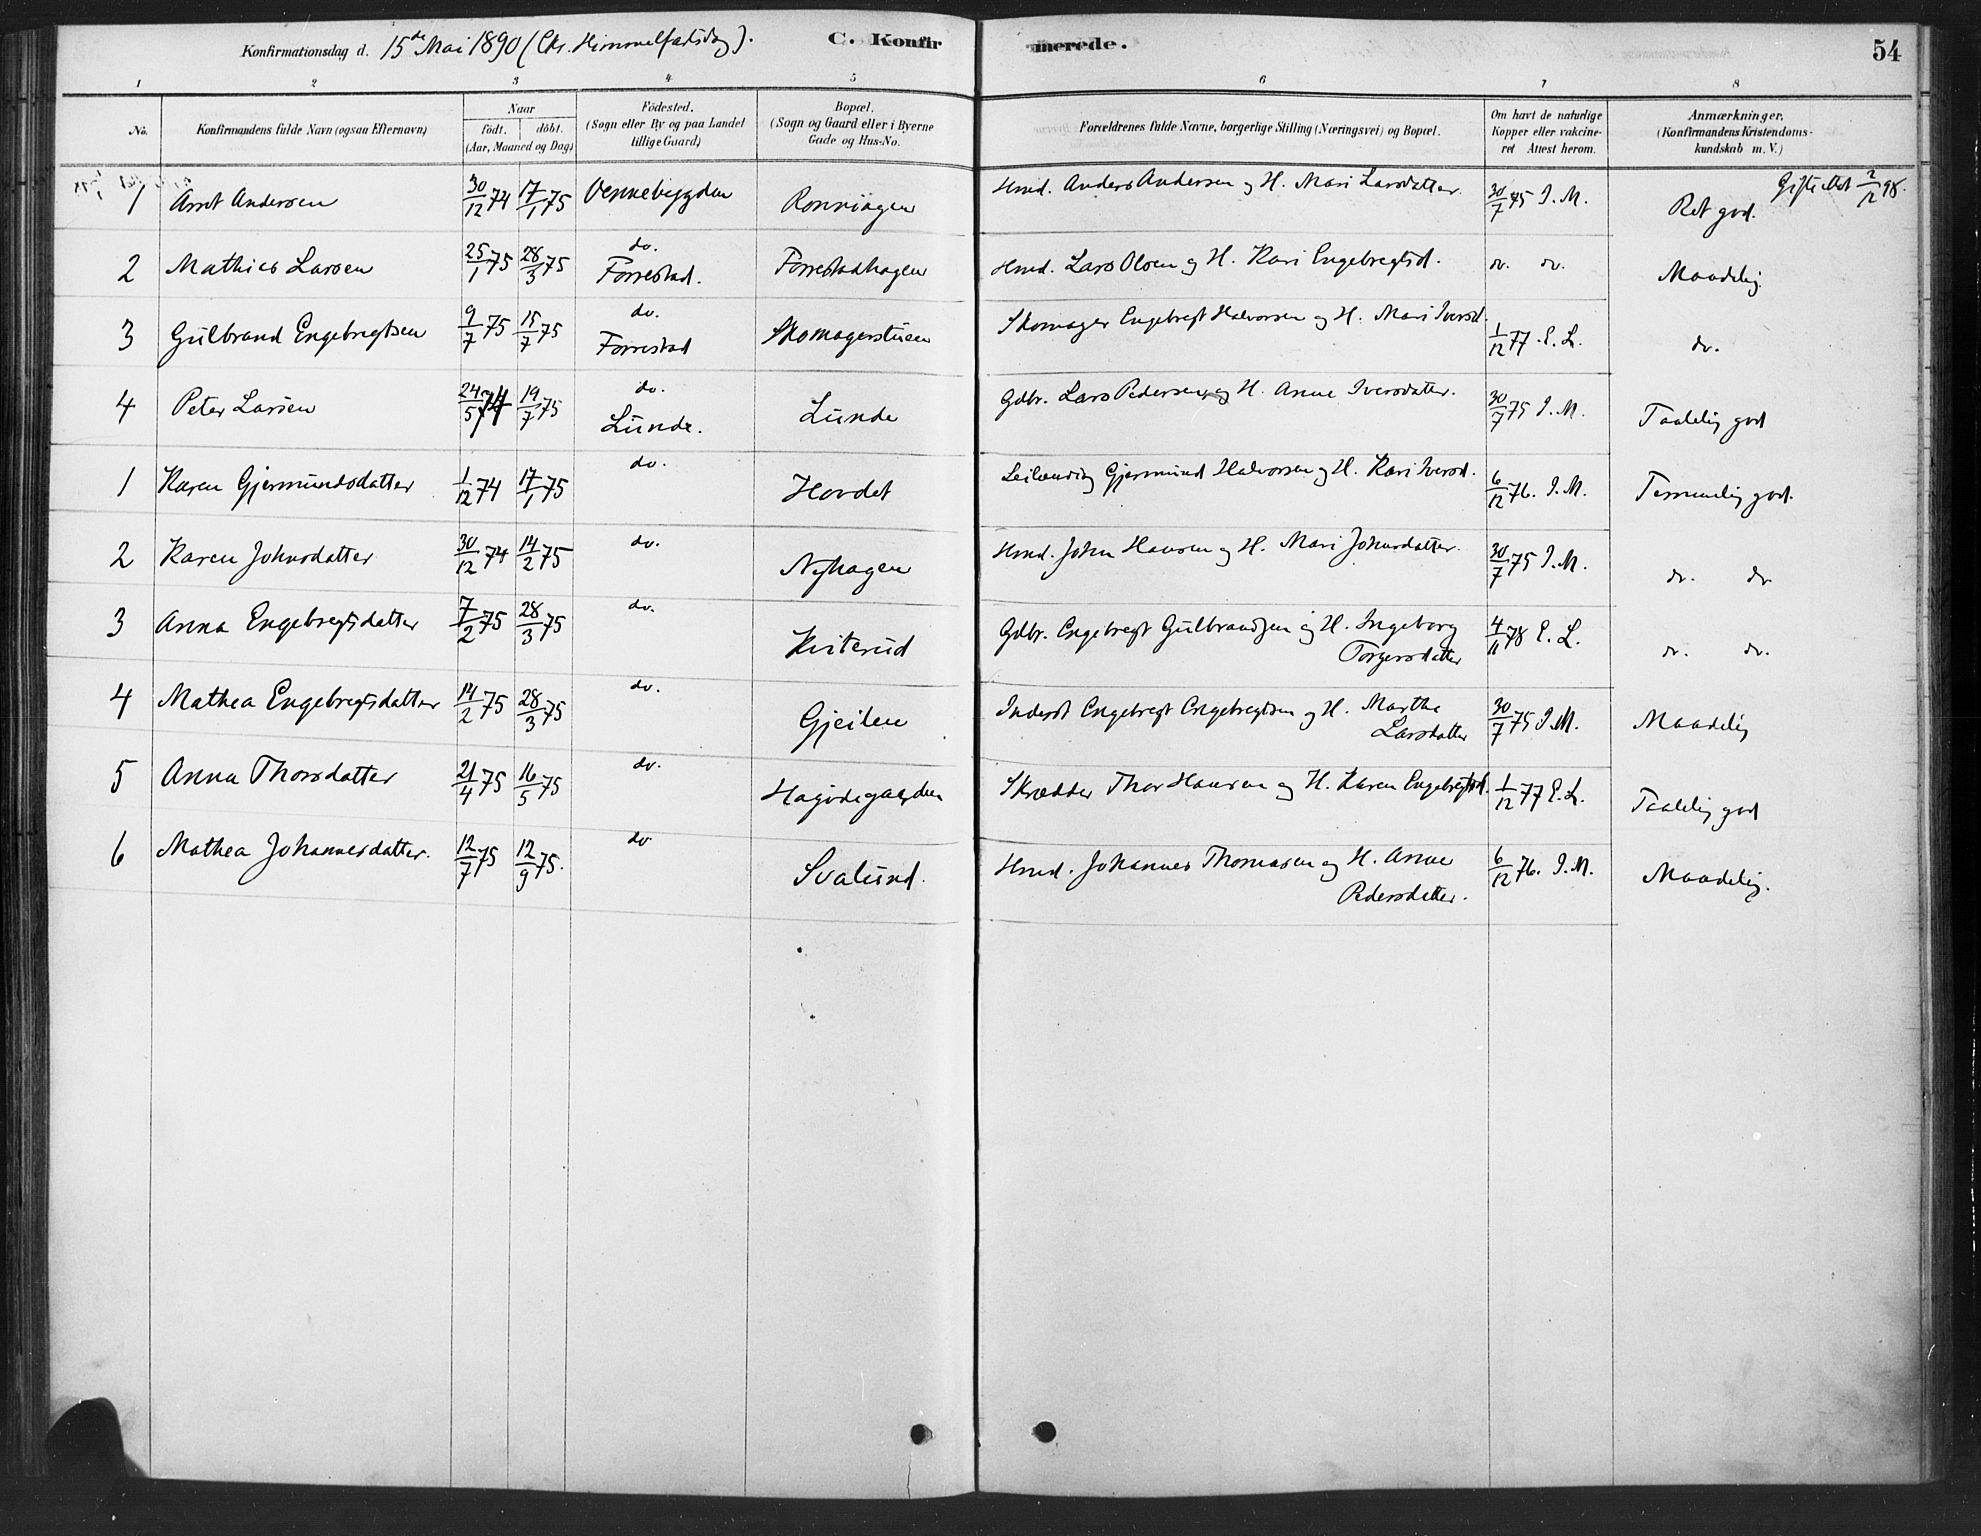 SAH, Ringebu prestekontor, Ministerialbok nr. 10, 1878-1898, s. 54